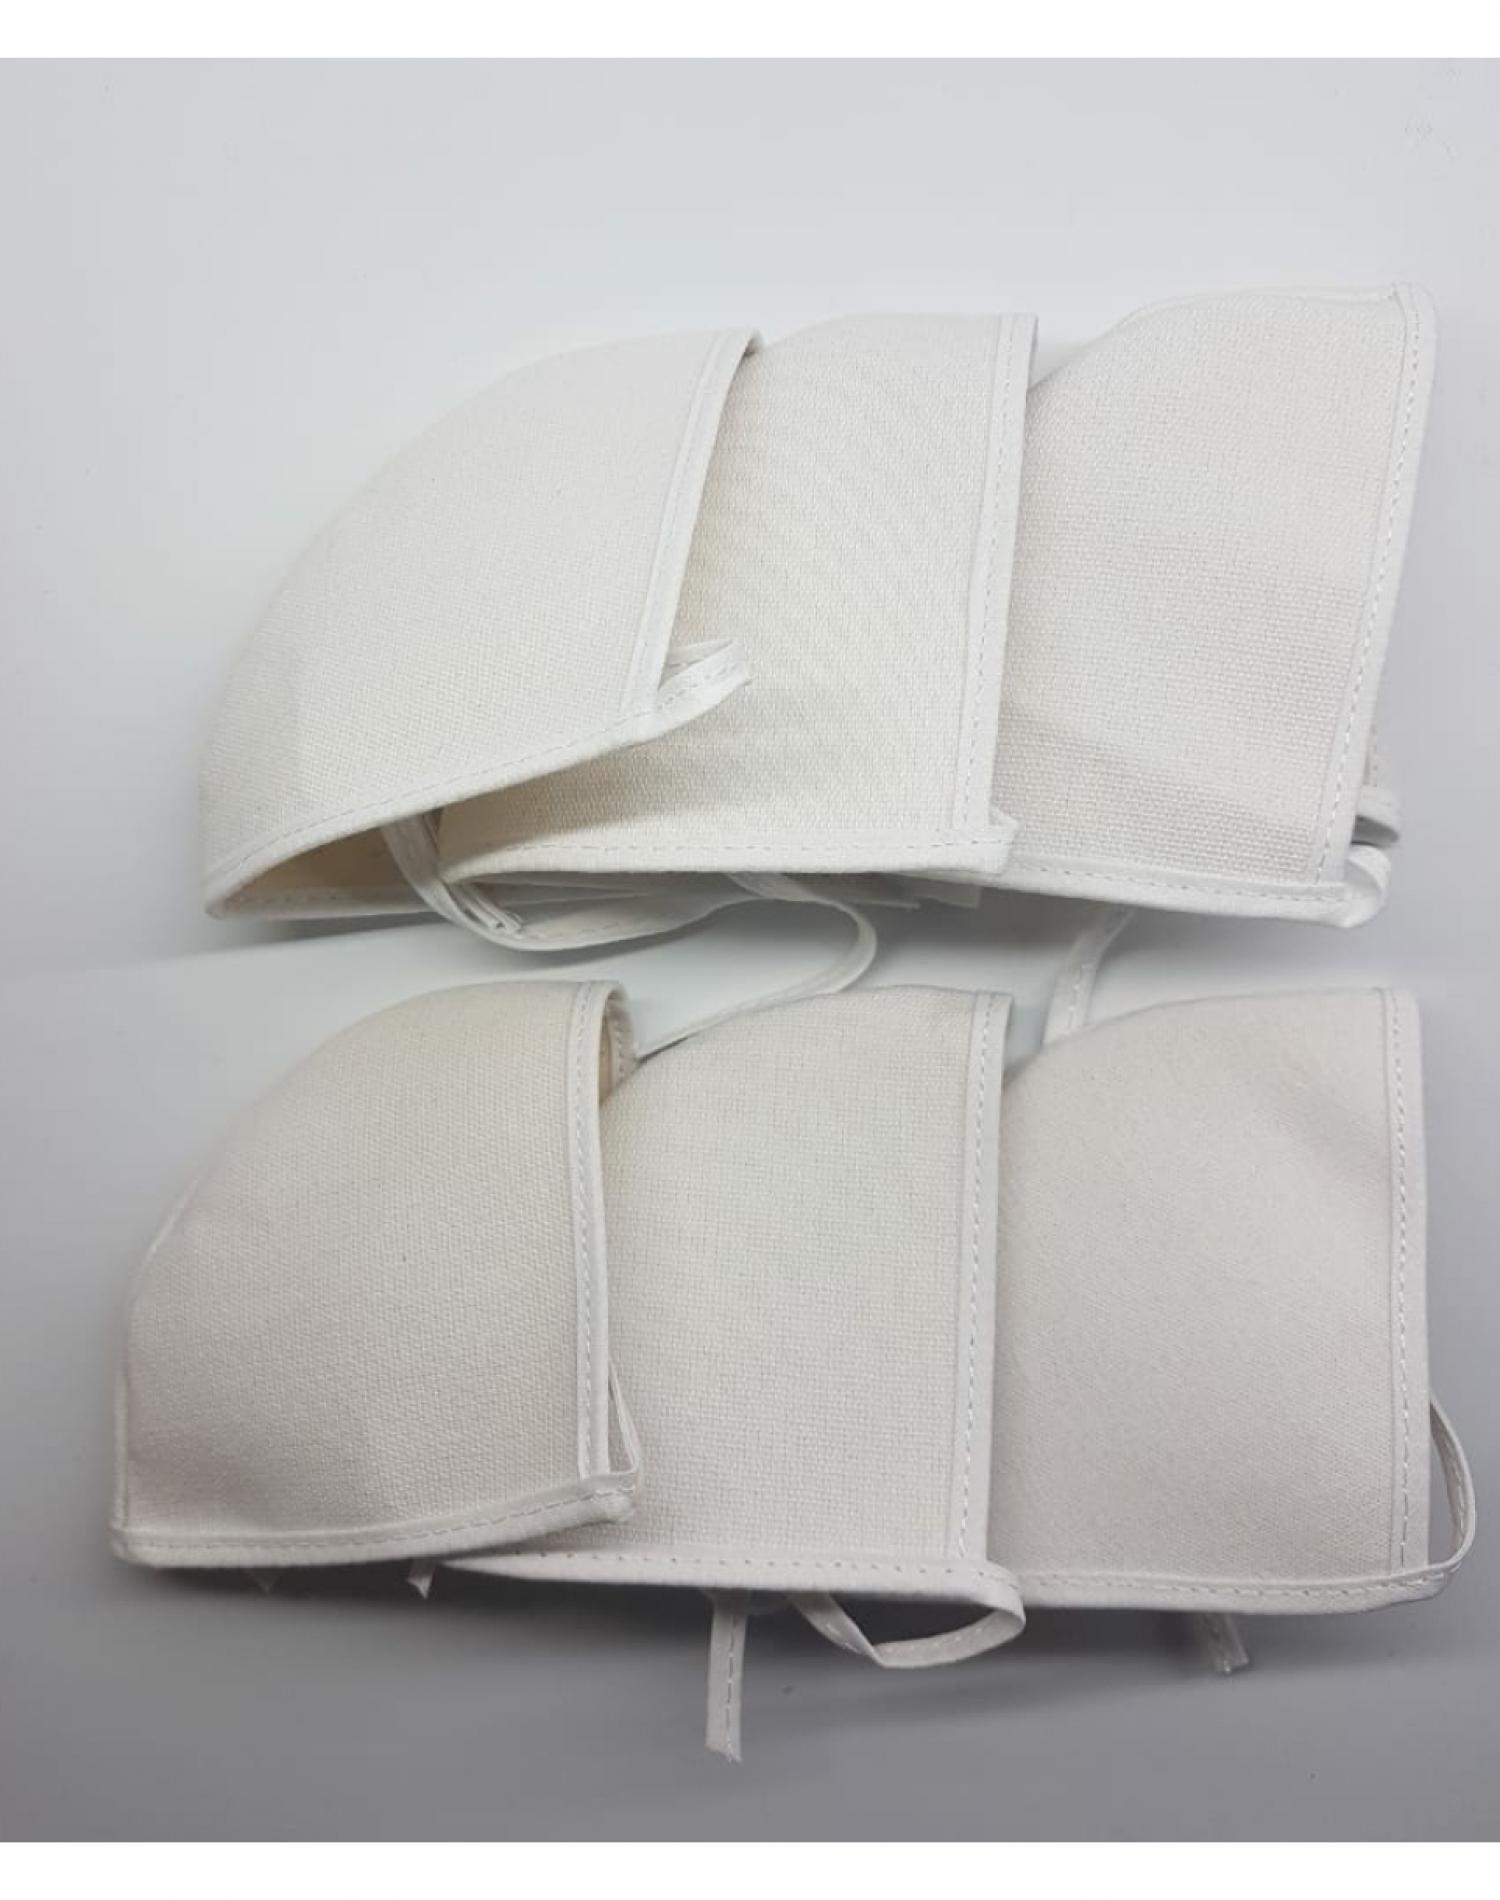 Pack de Tapabocas Blanco Roi x 6